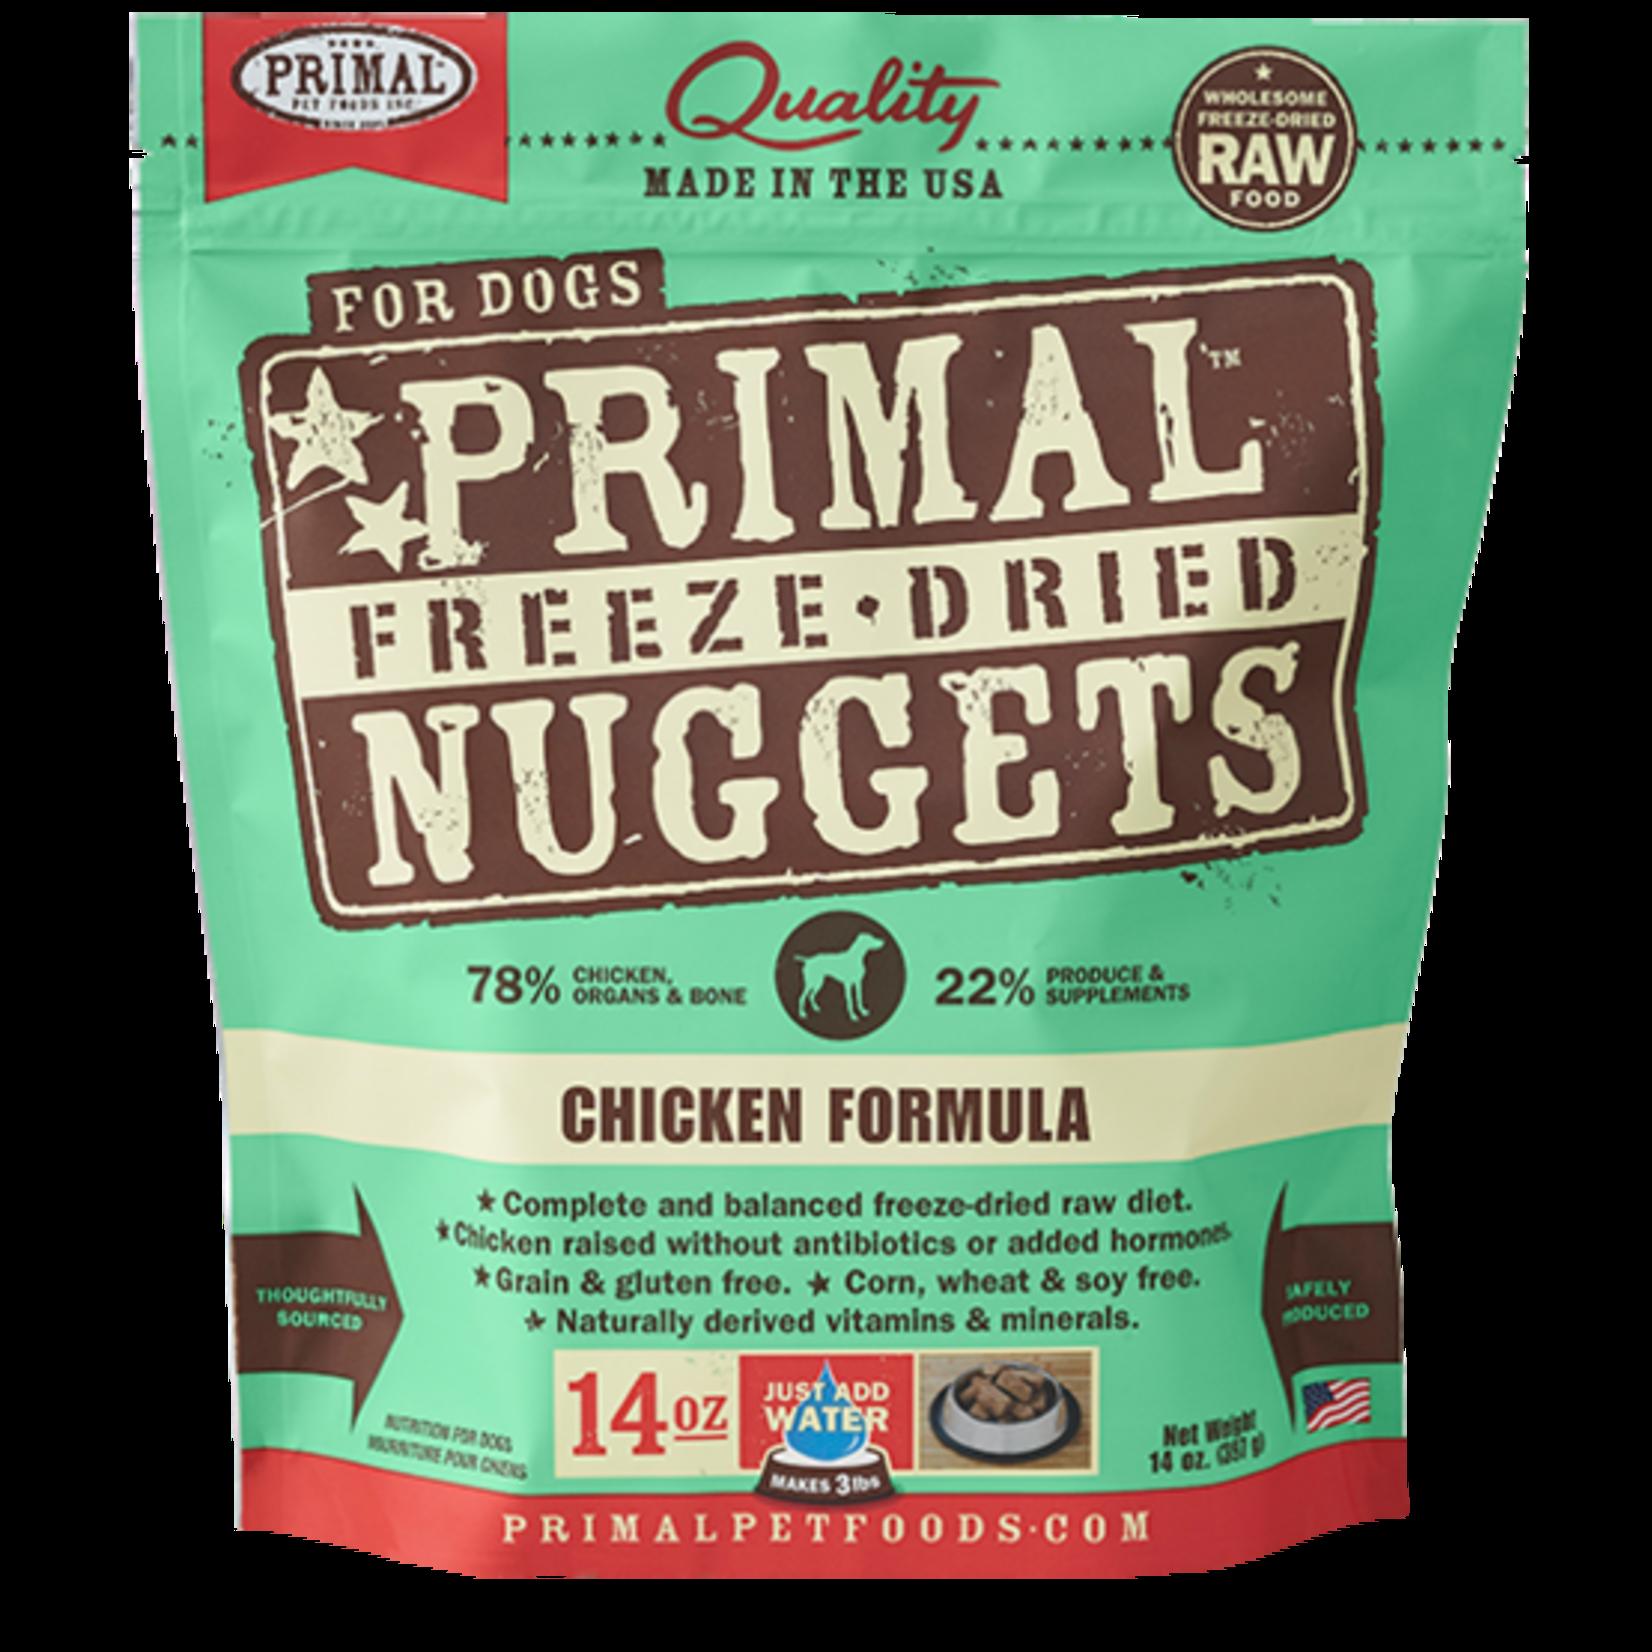 Primal Pet Foods Primal Dog Freeze-dried Chicken Nuggets 14 OZ